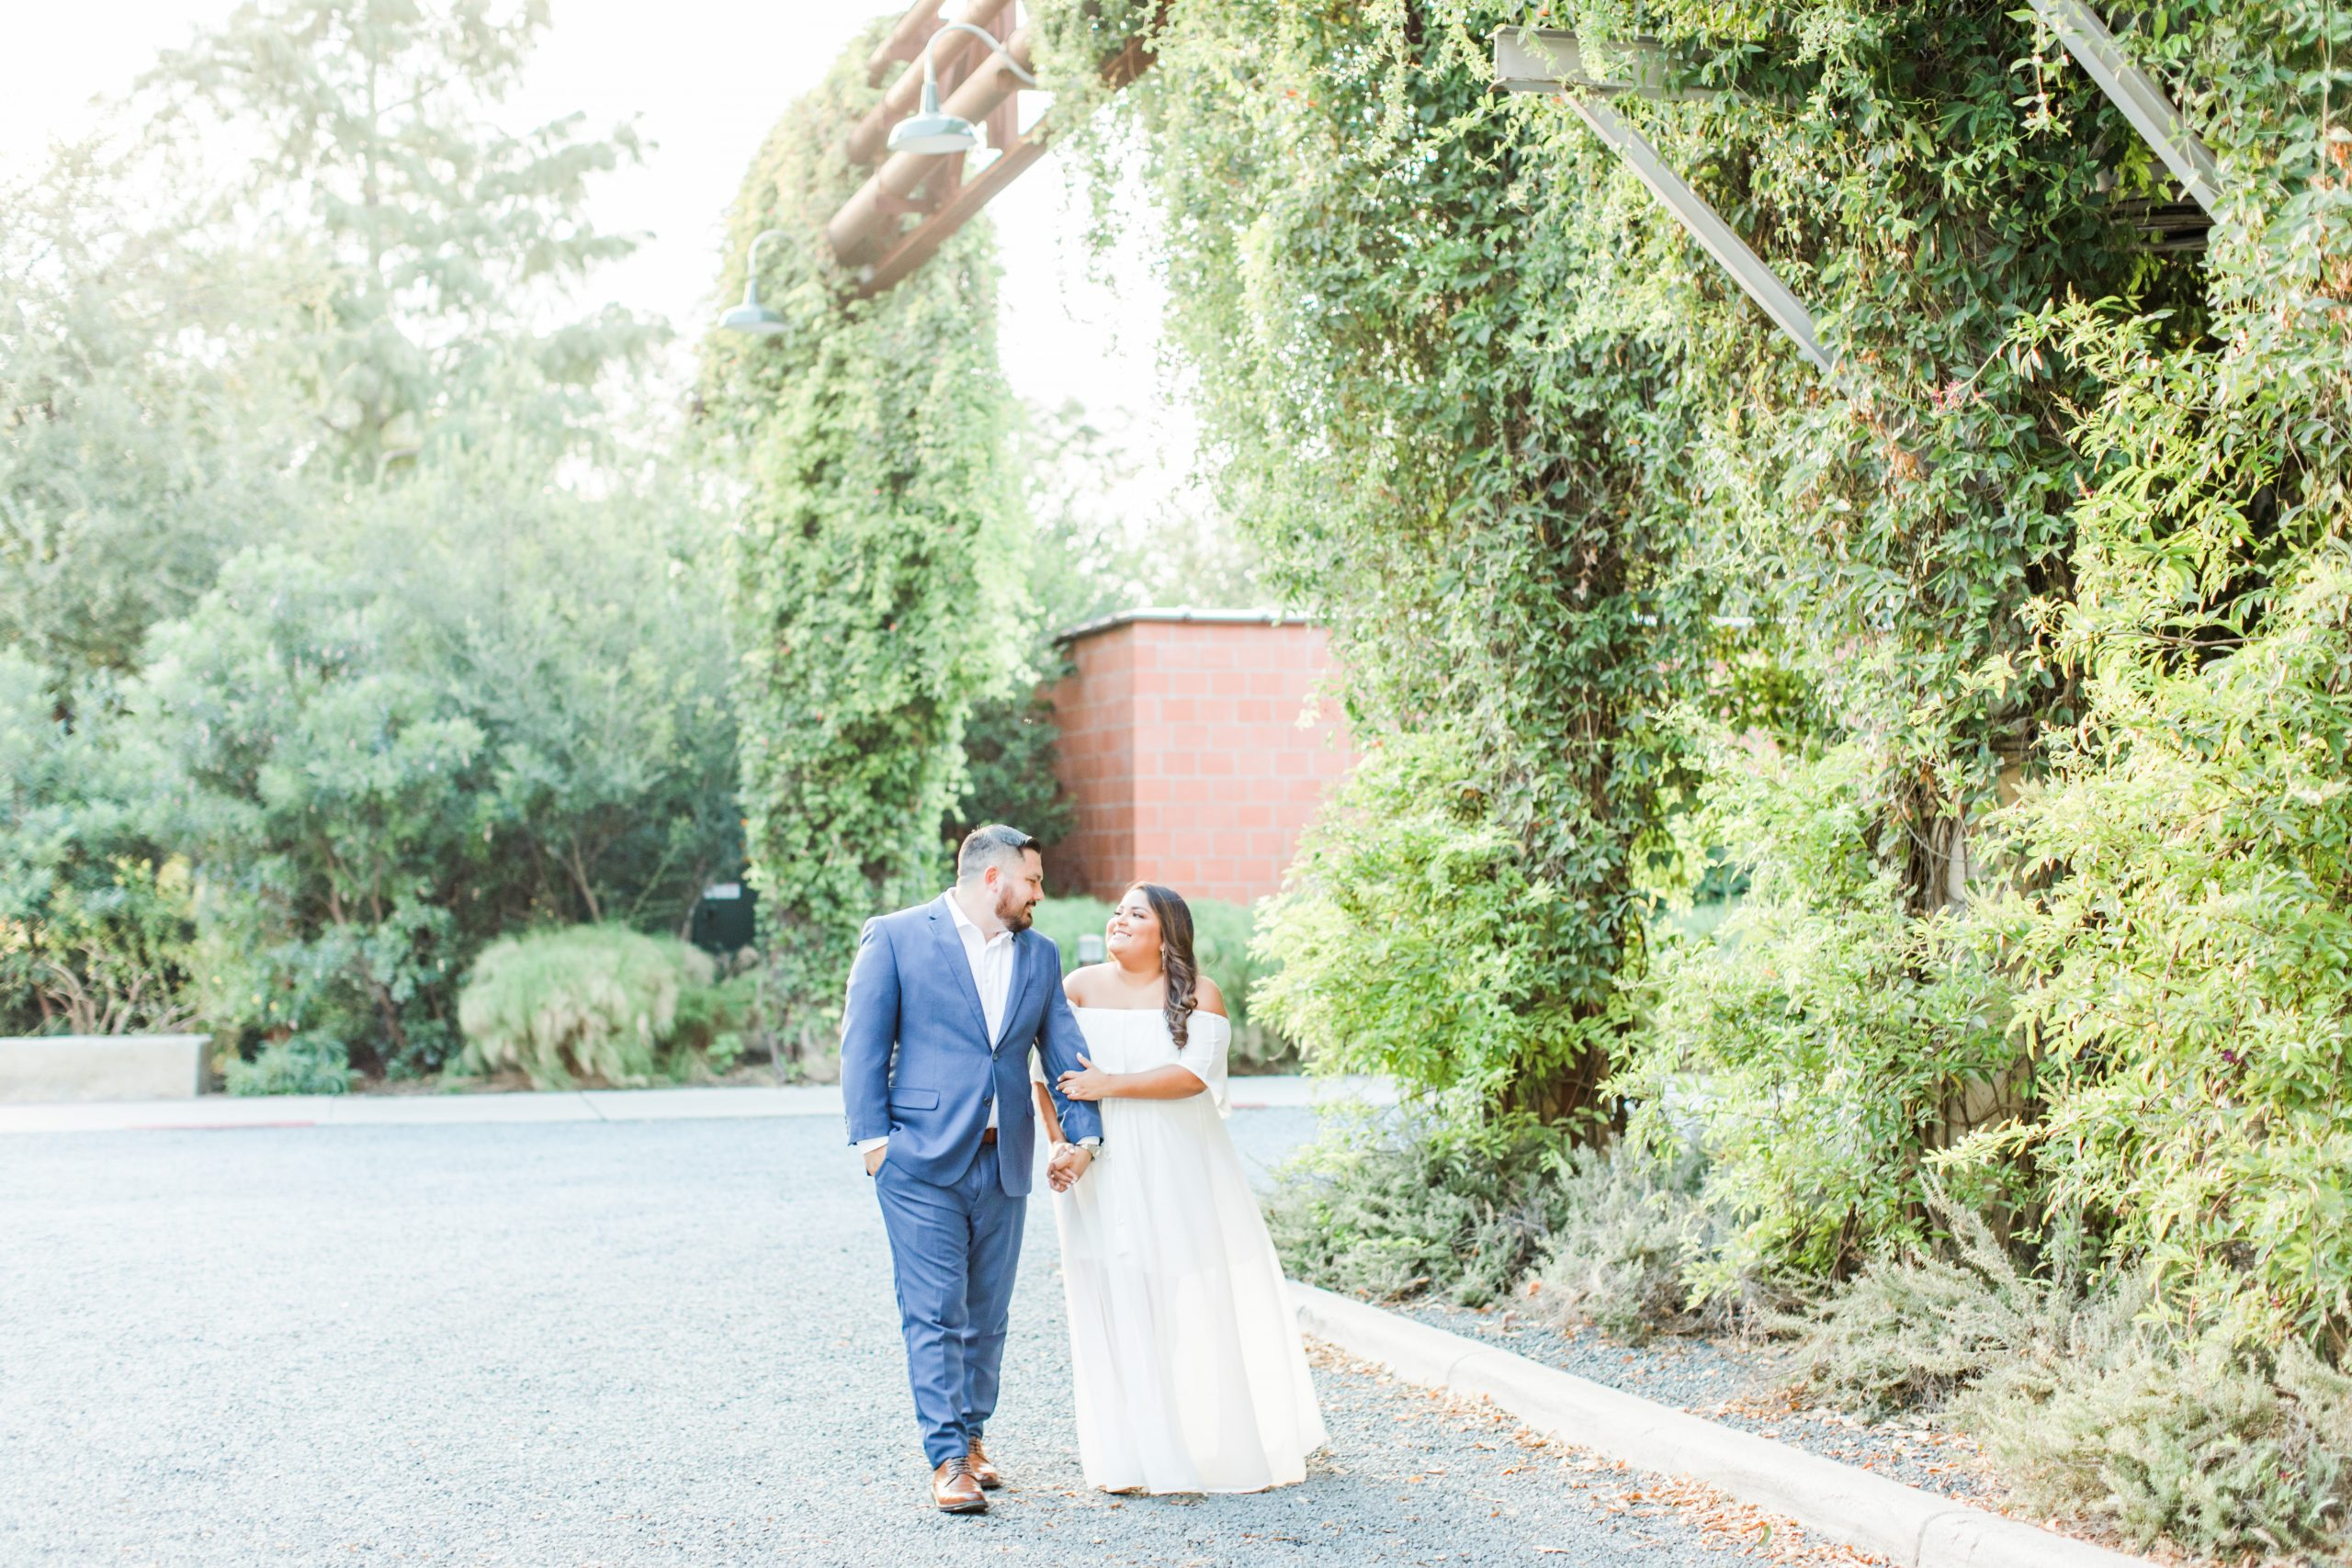 Allison jeffers photography San Antonio weddings